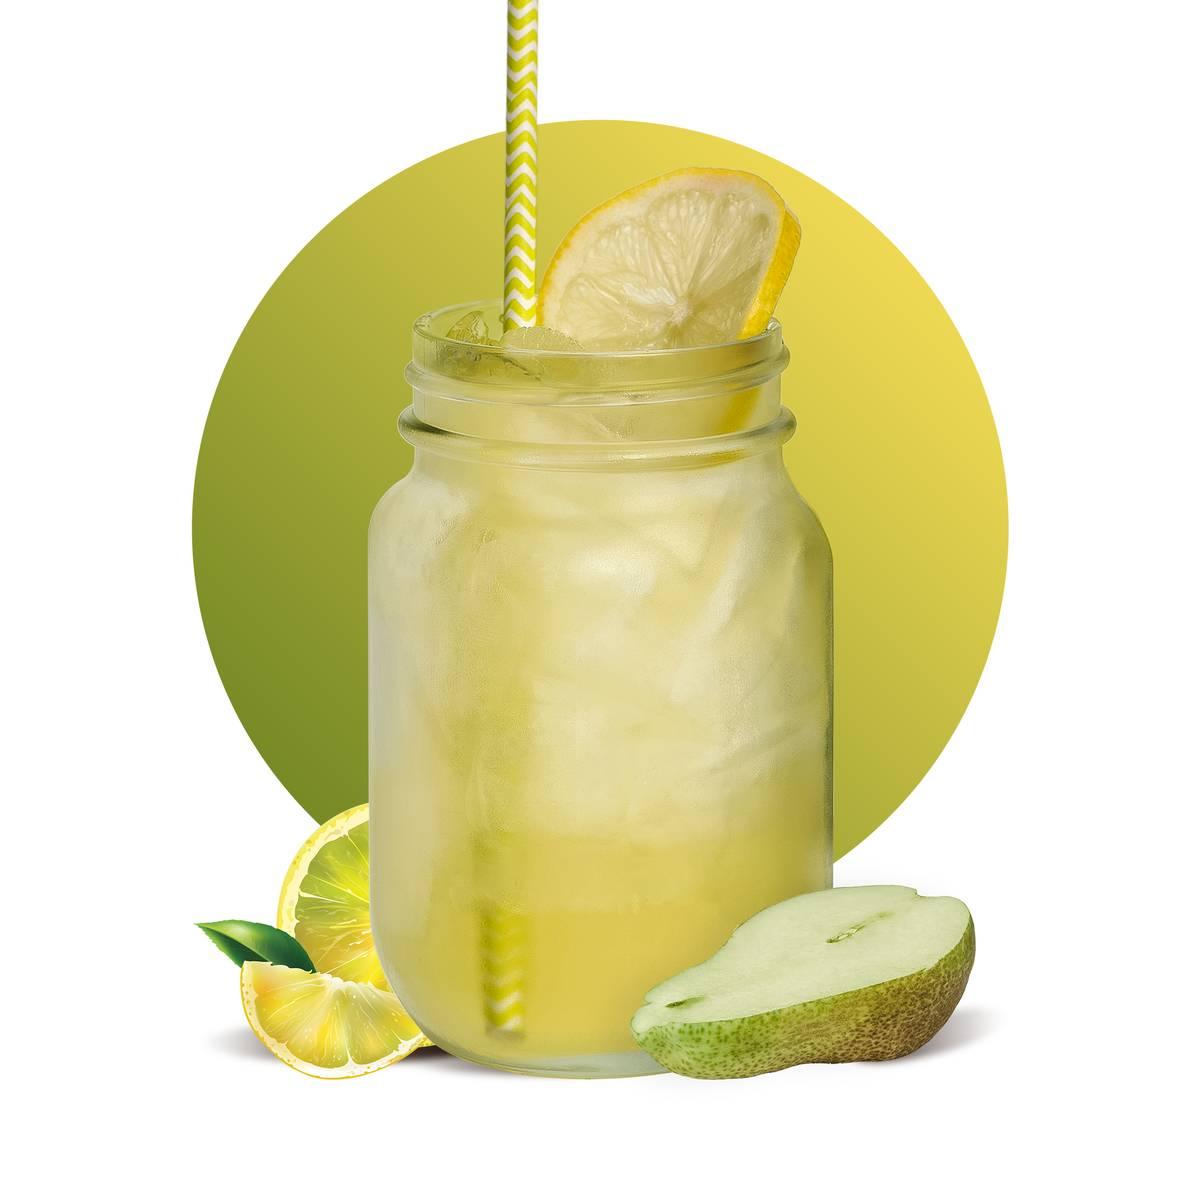 Coconut Pear Lemonade Drink